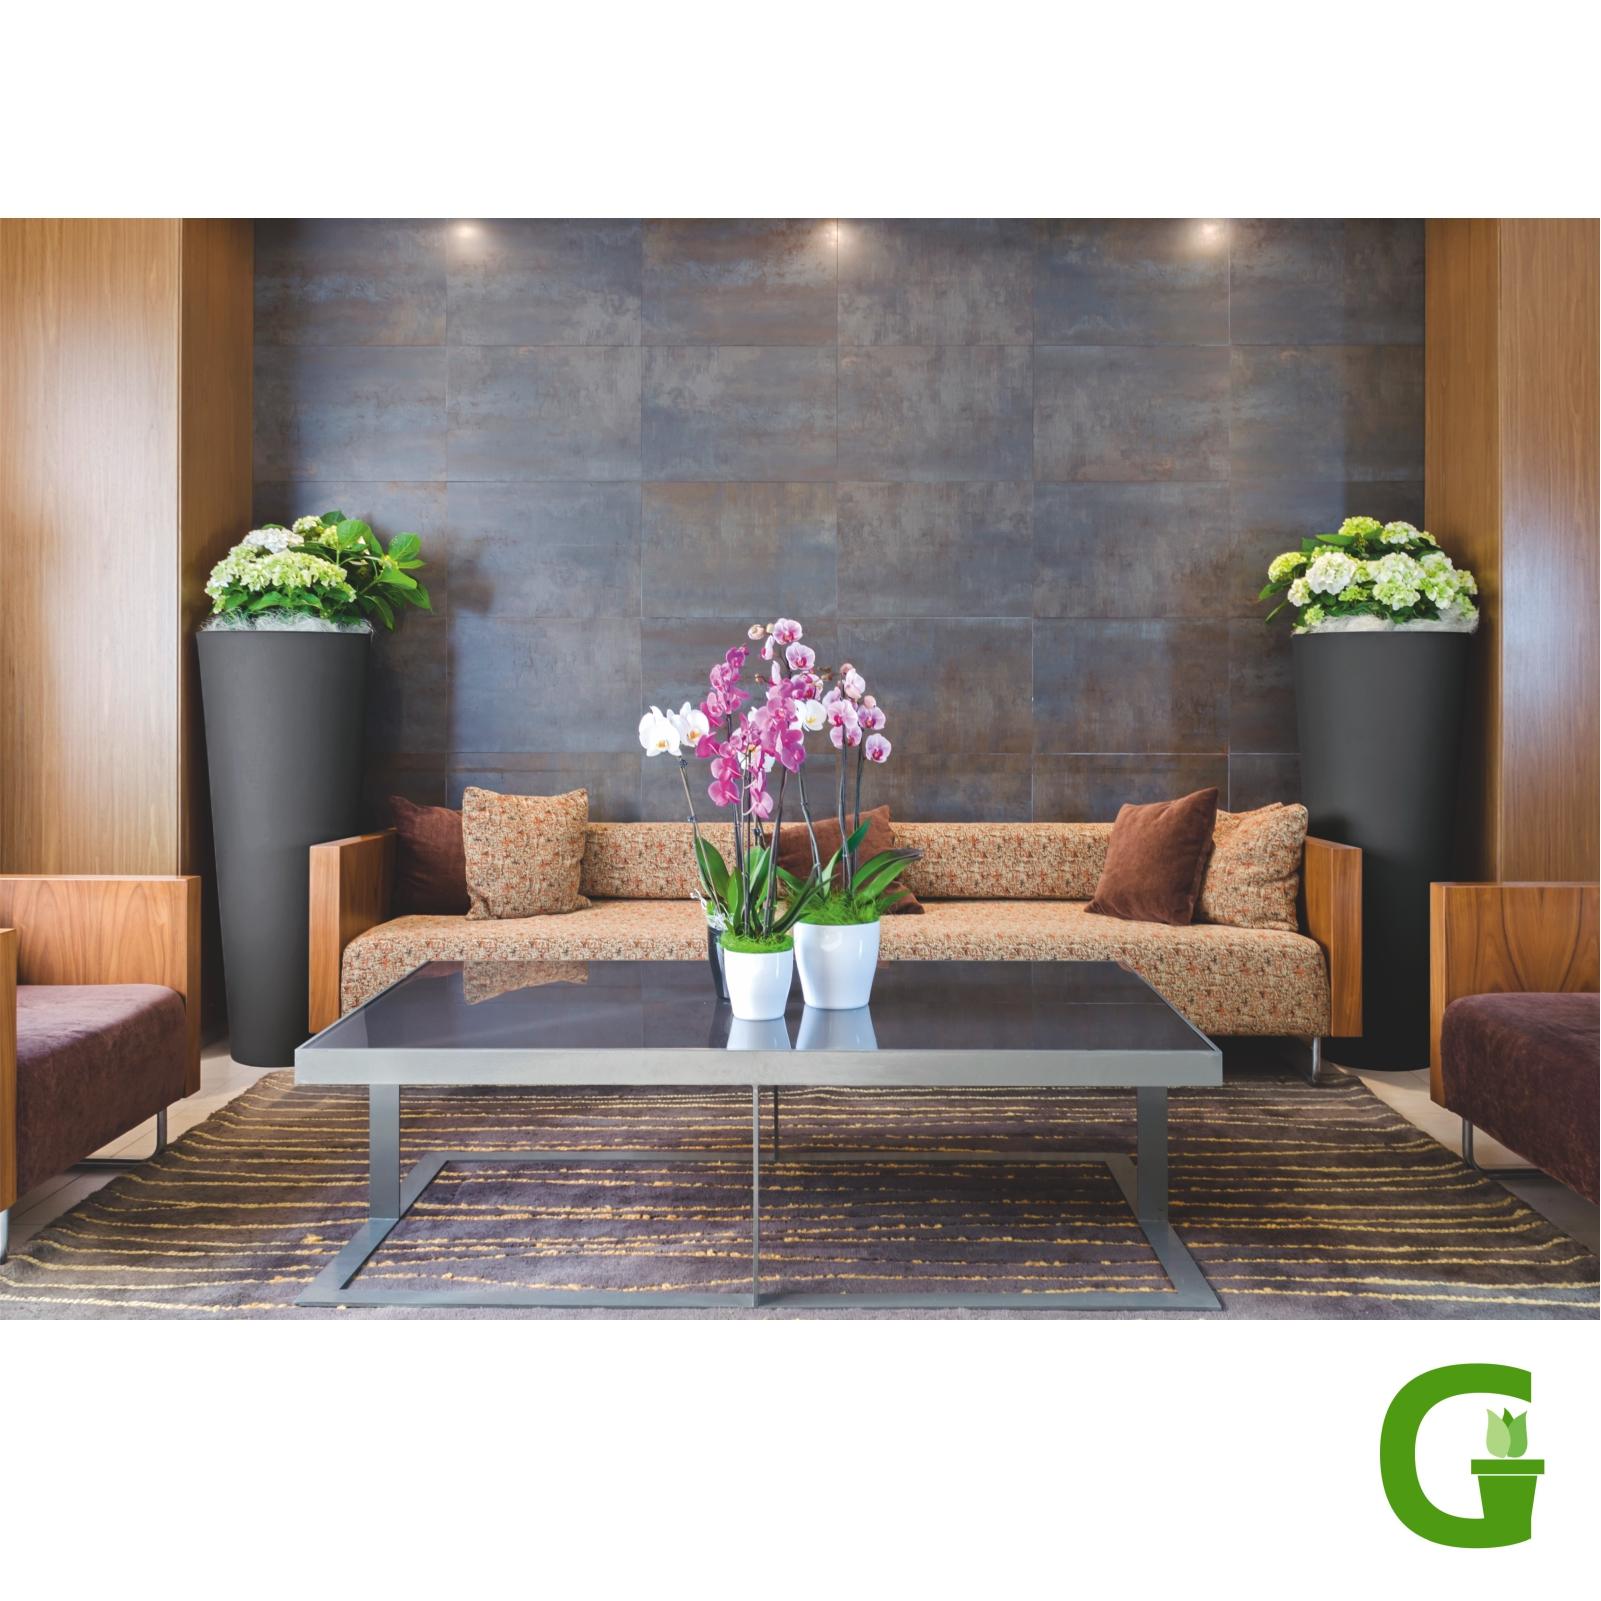 toscana pflanztopf 130 cm hoch office pflanzgef e alles um deinen. Black Bedroom Furniture Sets. Home Design Ideas